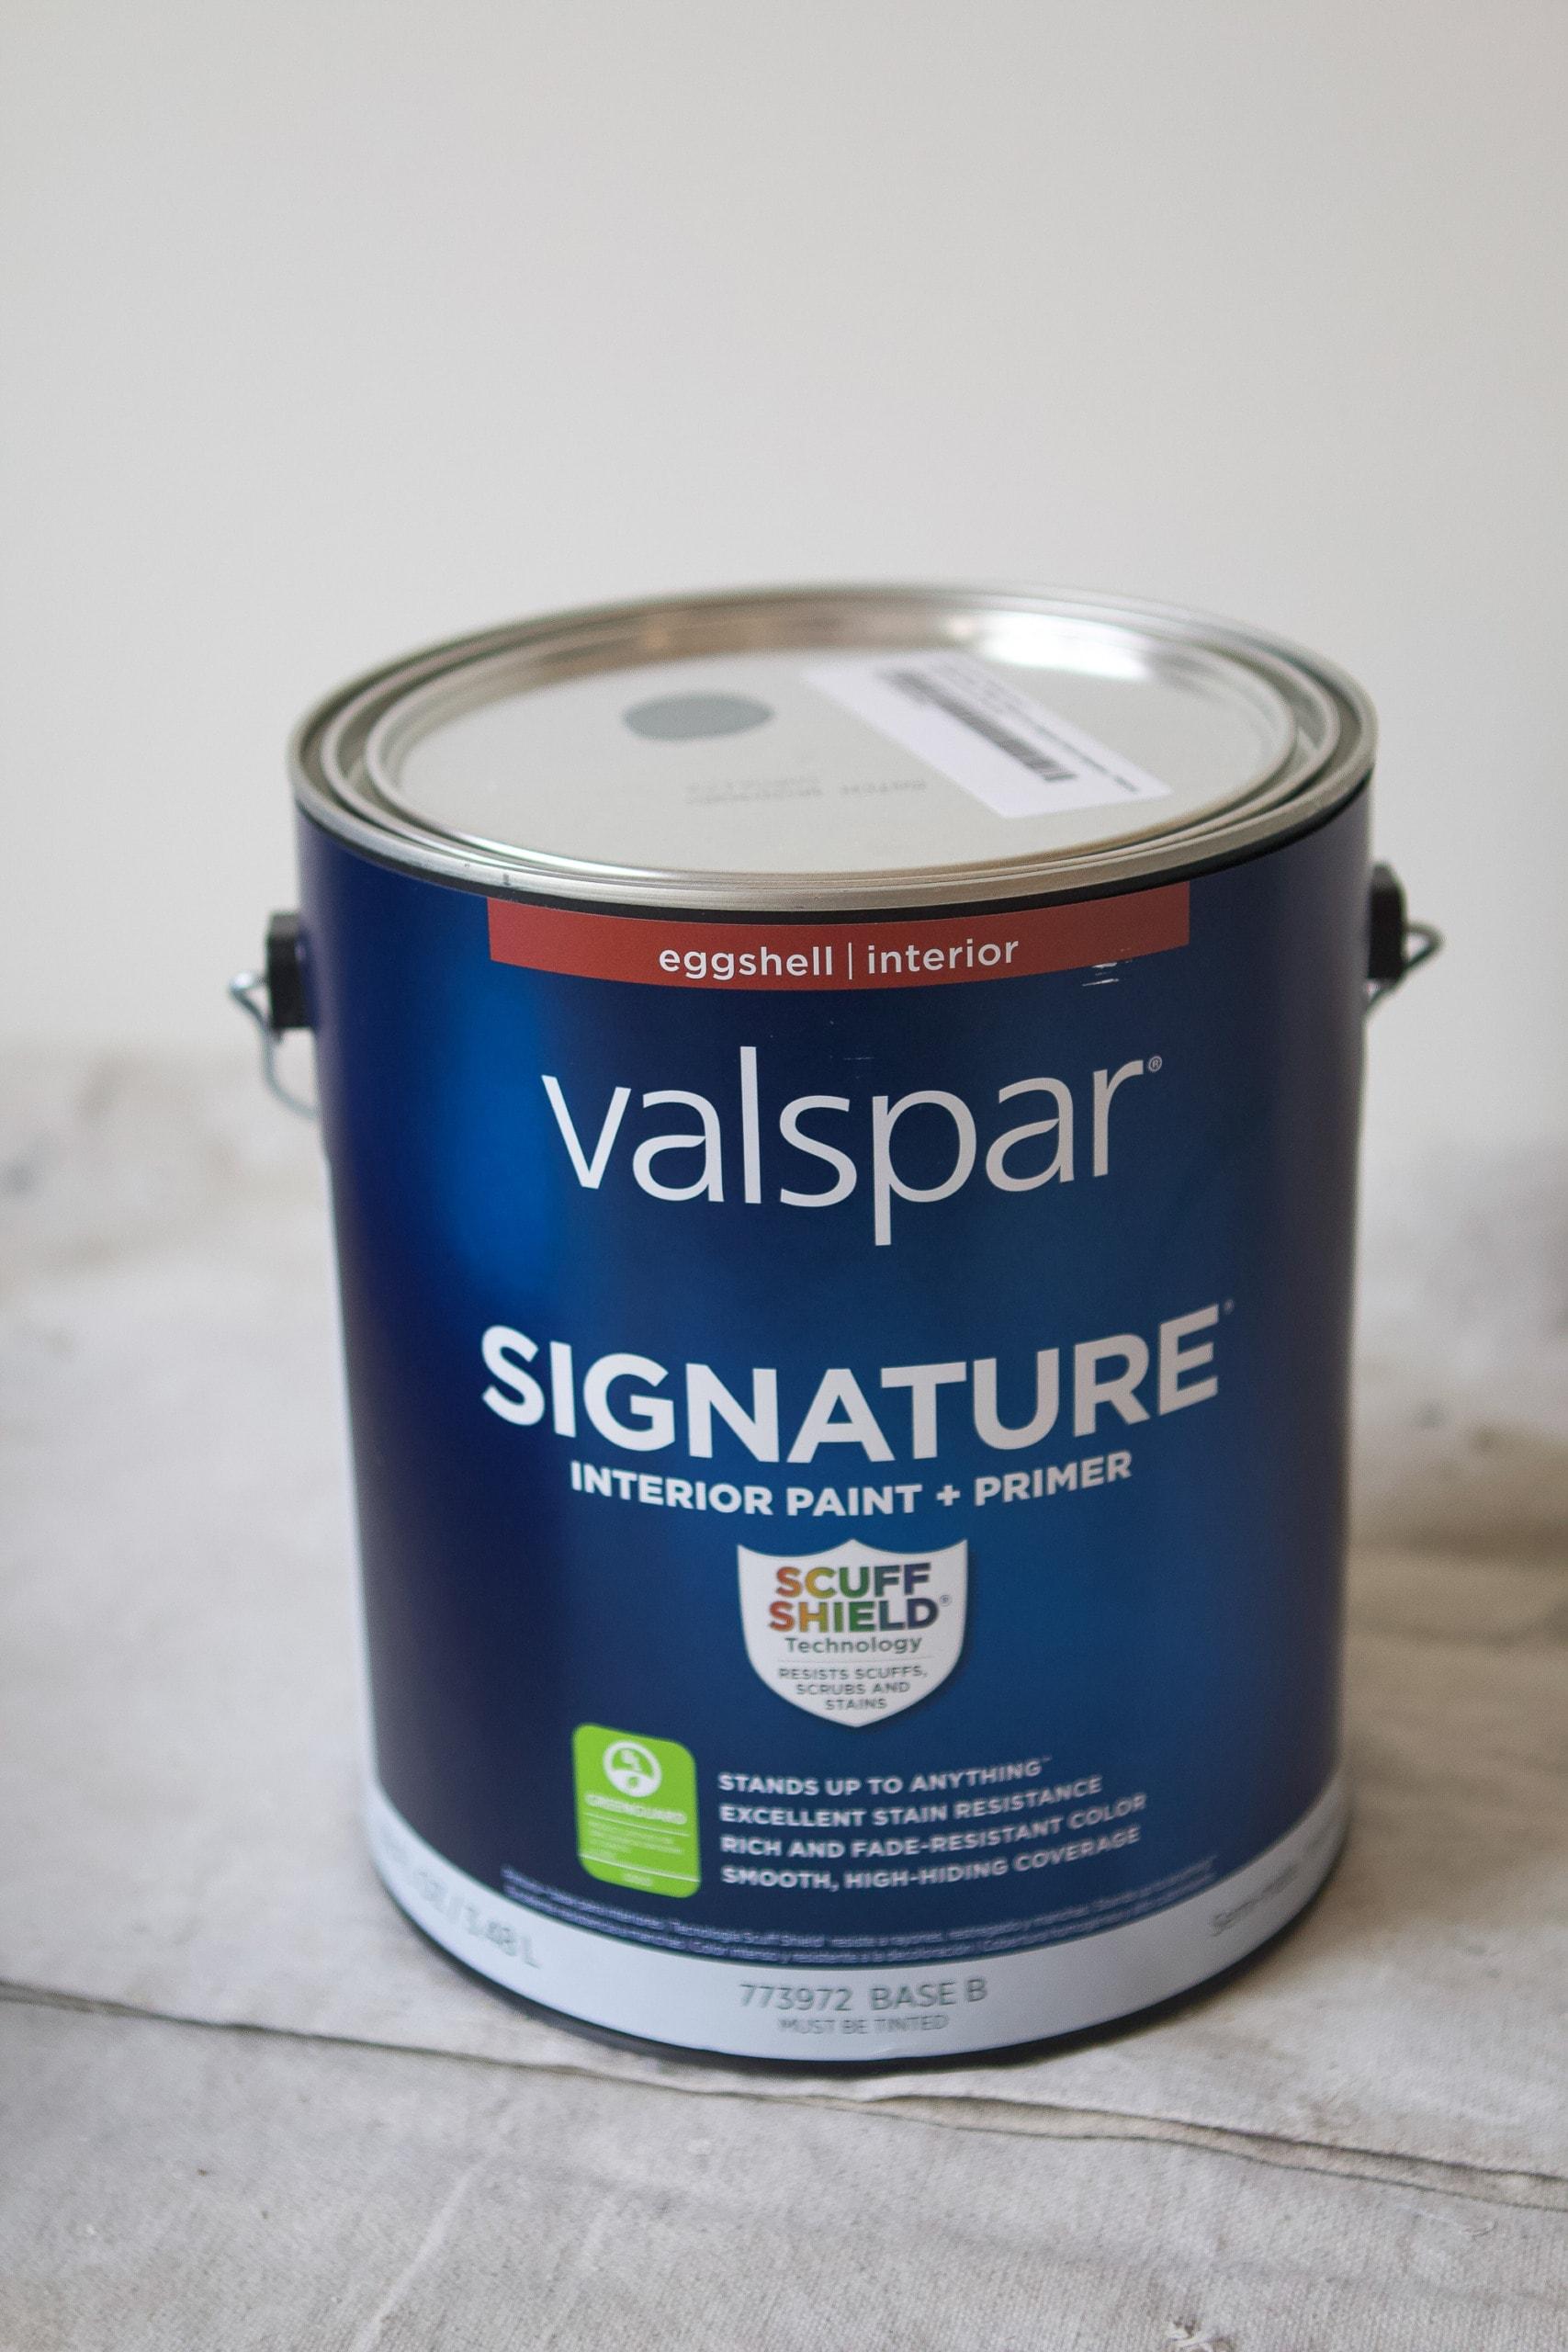 Choosing Valspar signature paint